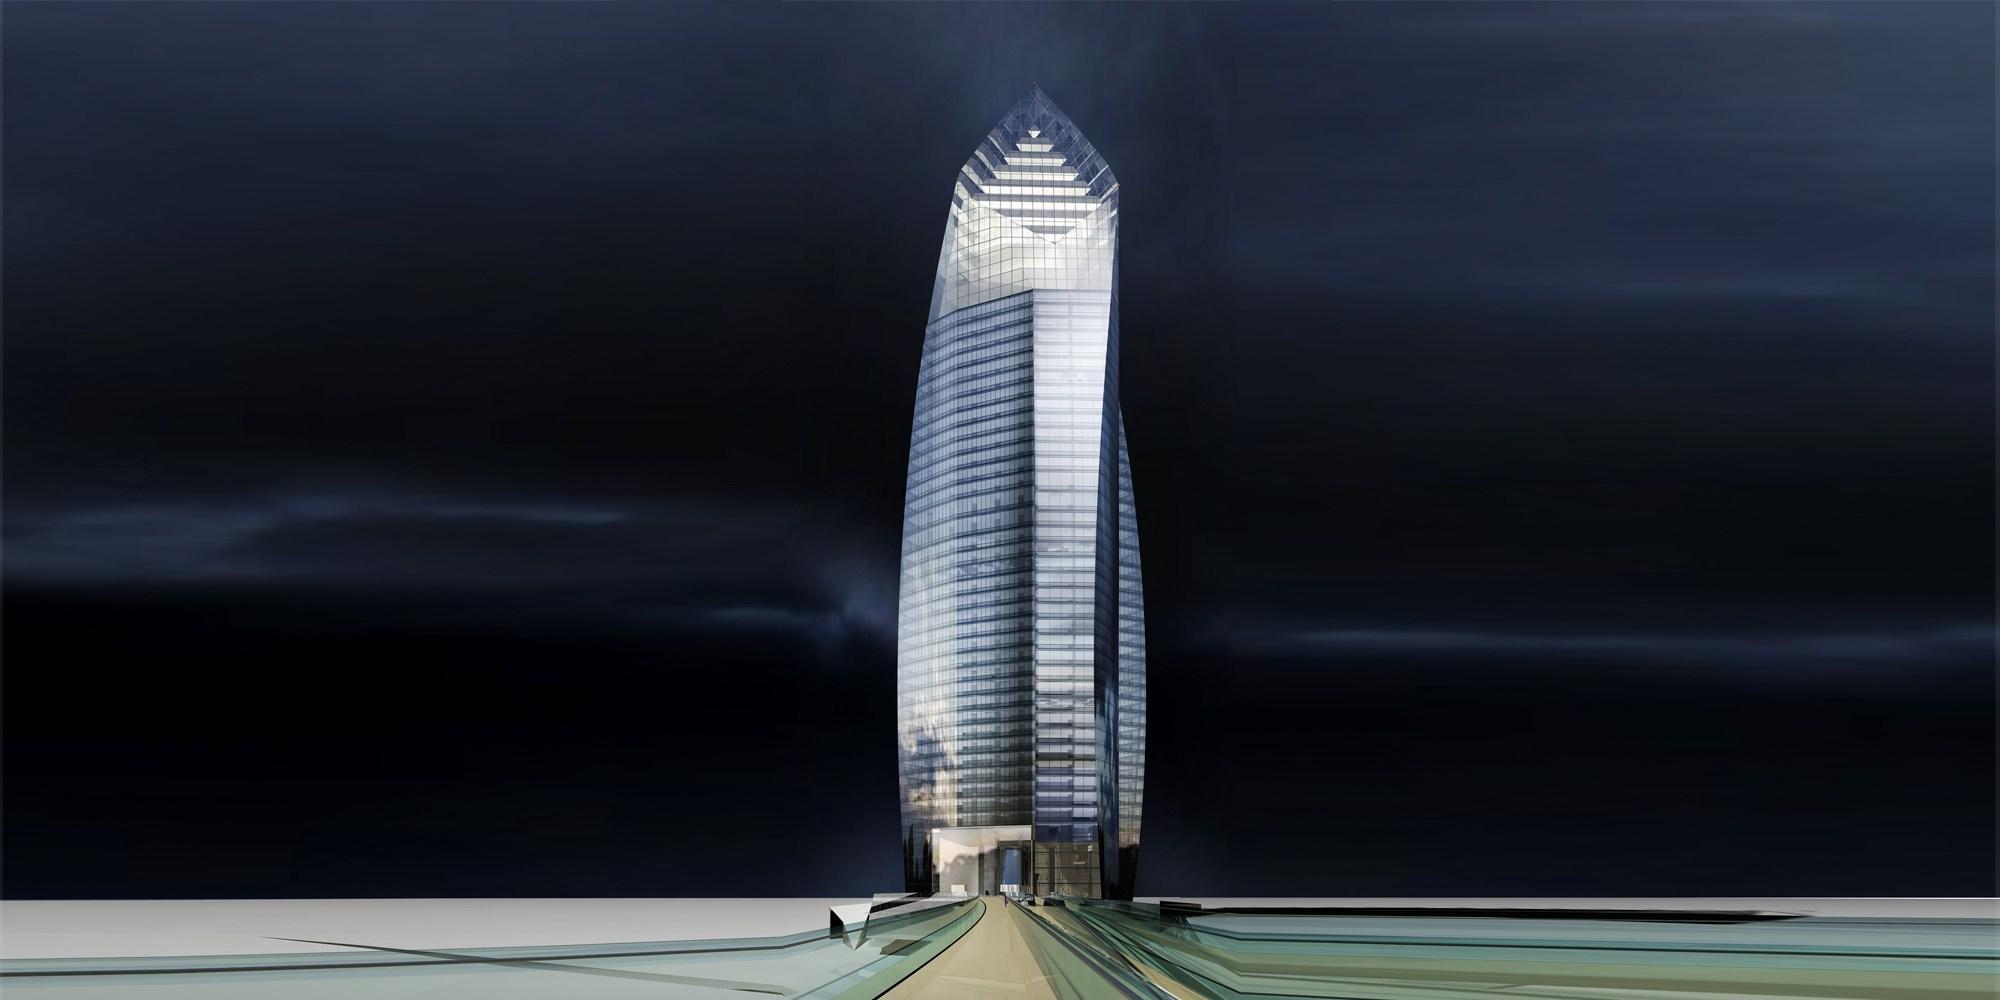 Pontoise Tower